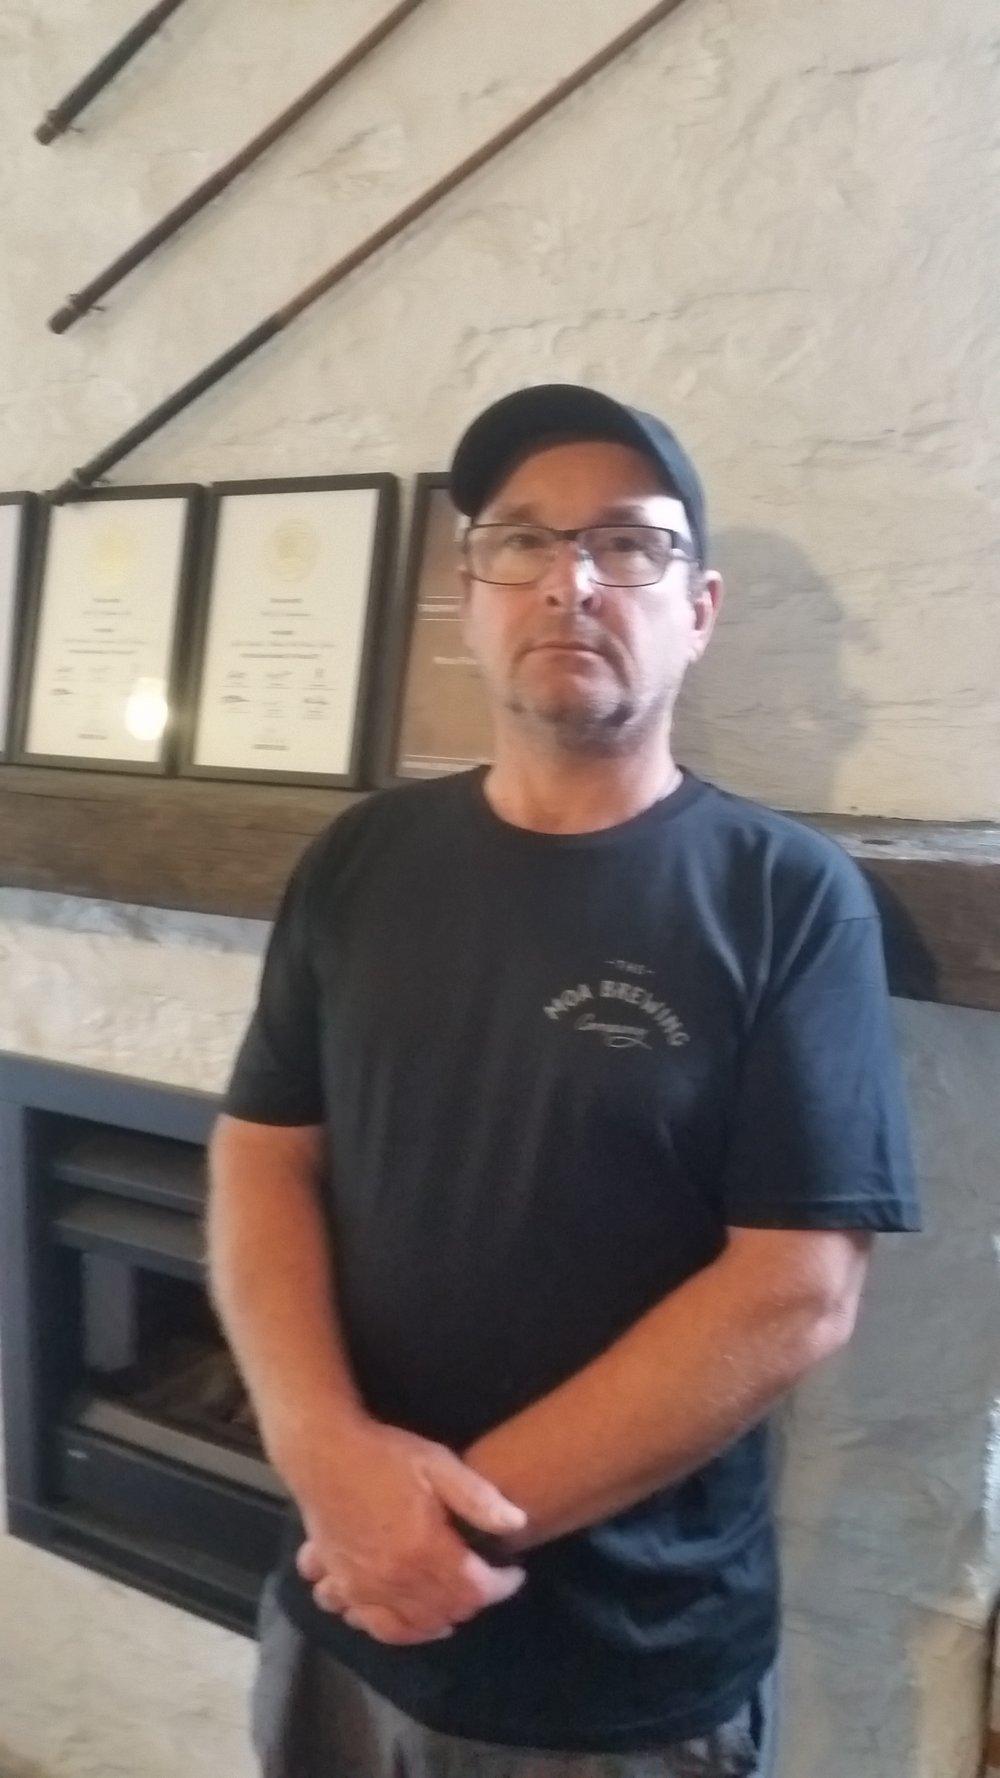 David Nicholls    Board Member (Moa Brewing), Malborough